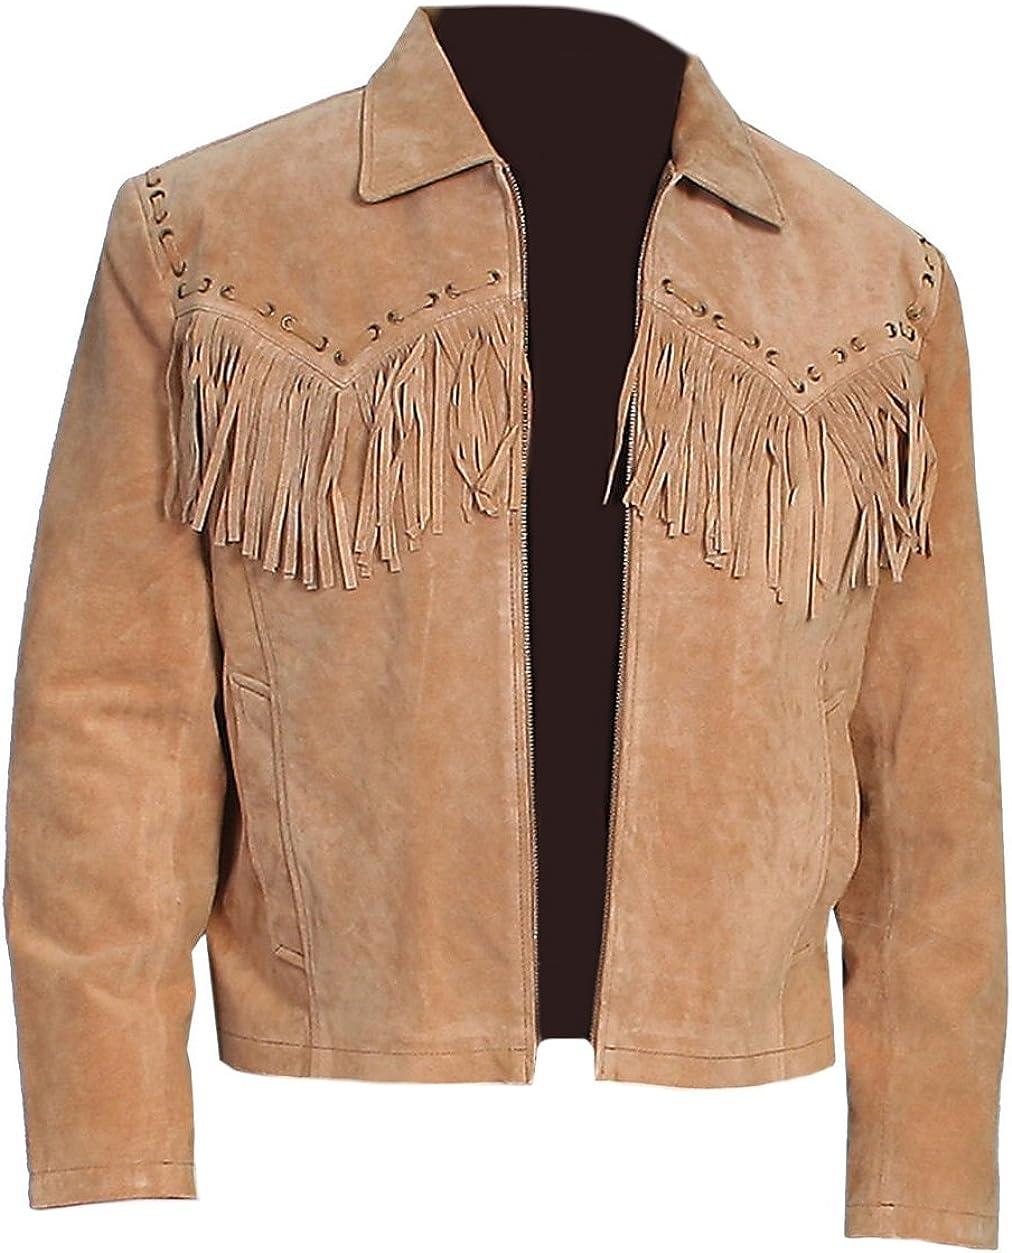 Classyak Men's Western Cowboy Suede Leather Jacket Brown